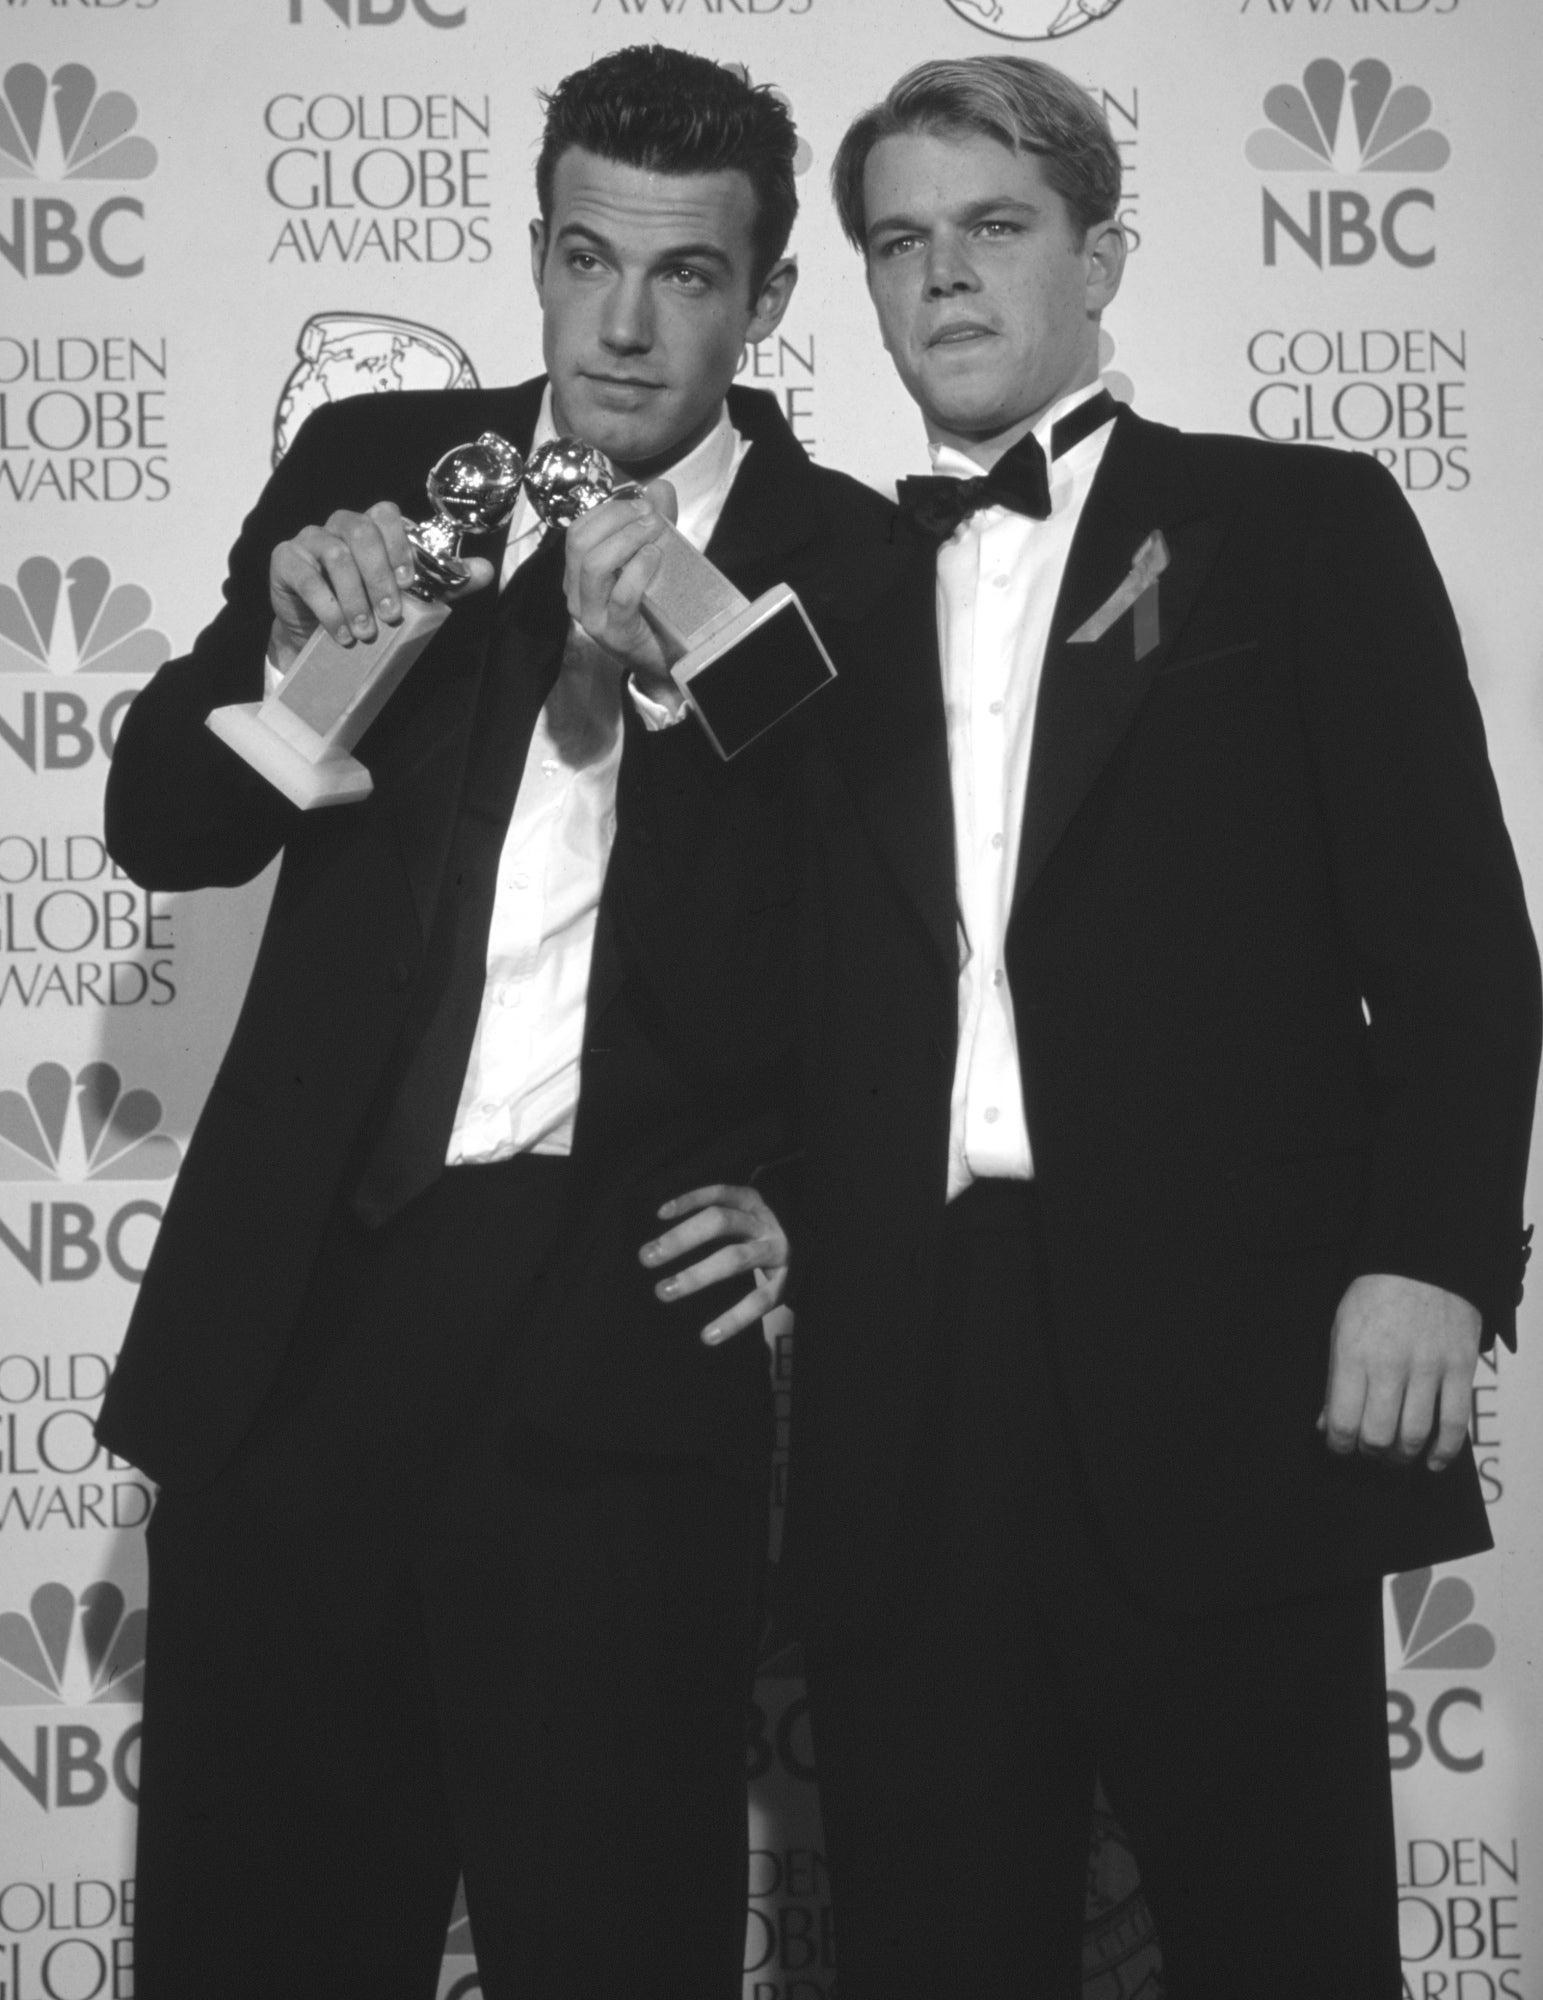 Actor Matt Damon, Golden Globe winner, and Ben Affleck wit thier Golden Globe for the screnplay of Good Will Hunting, 1998